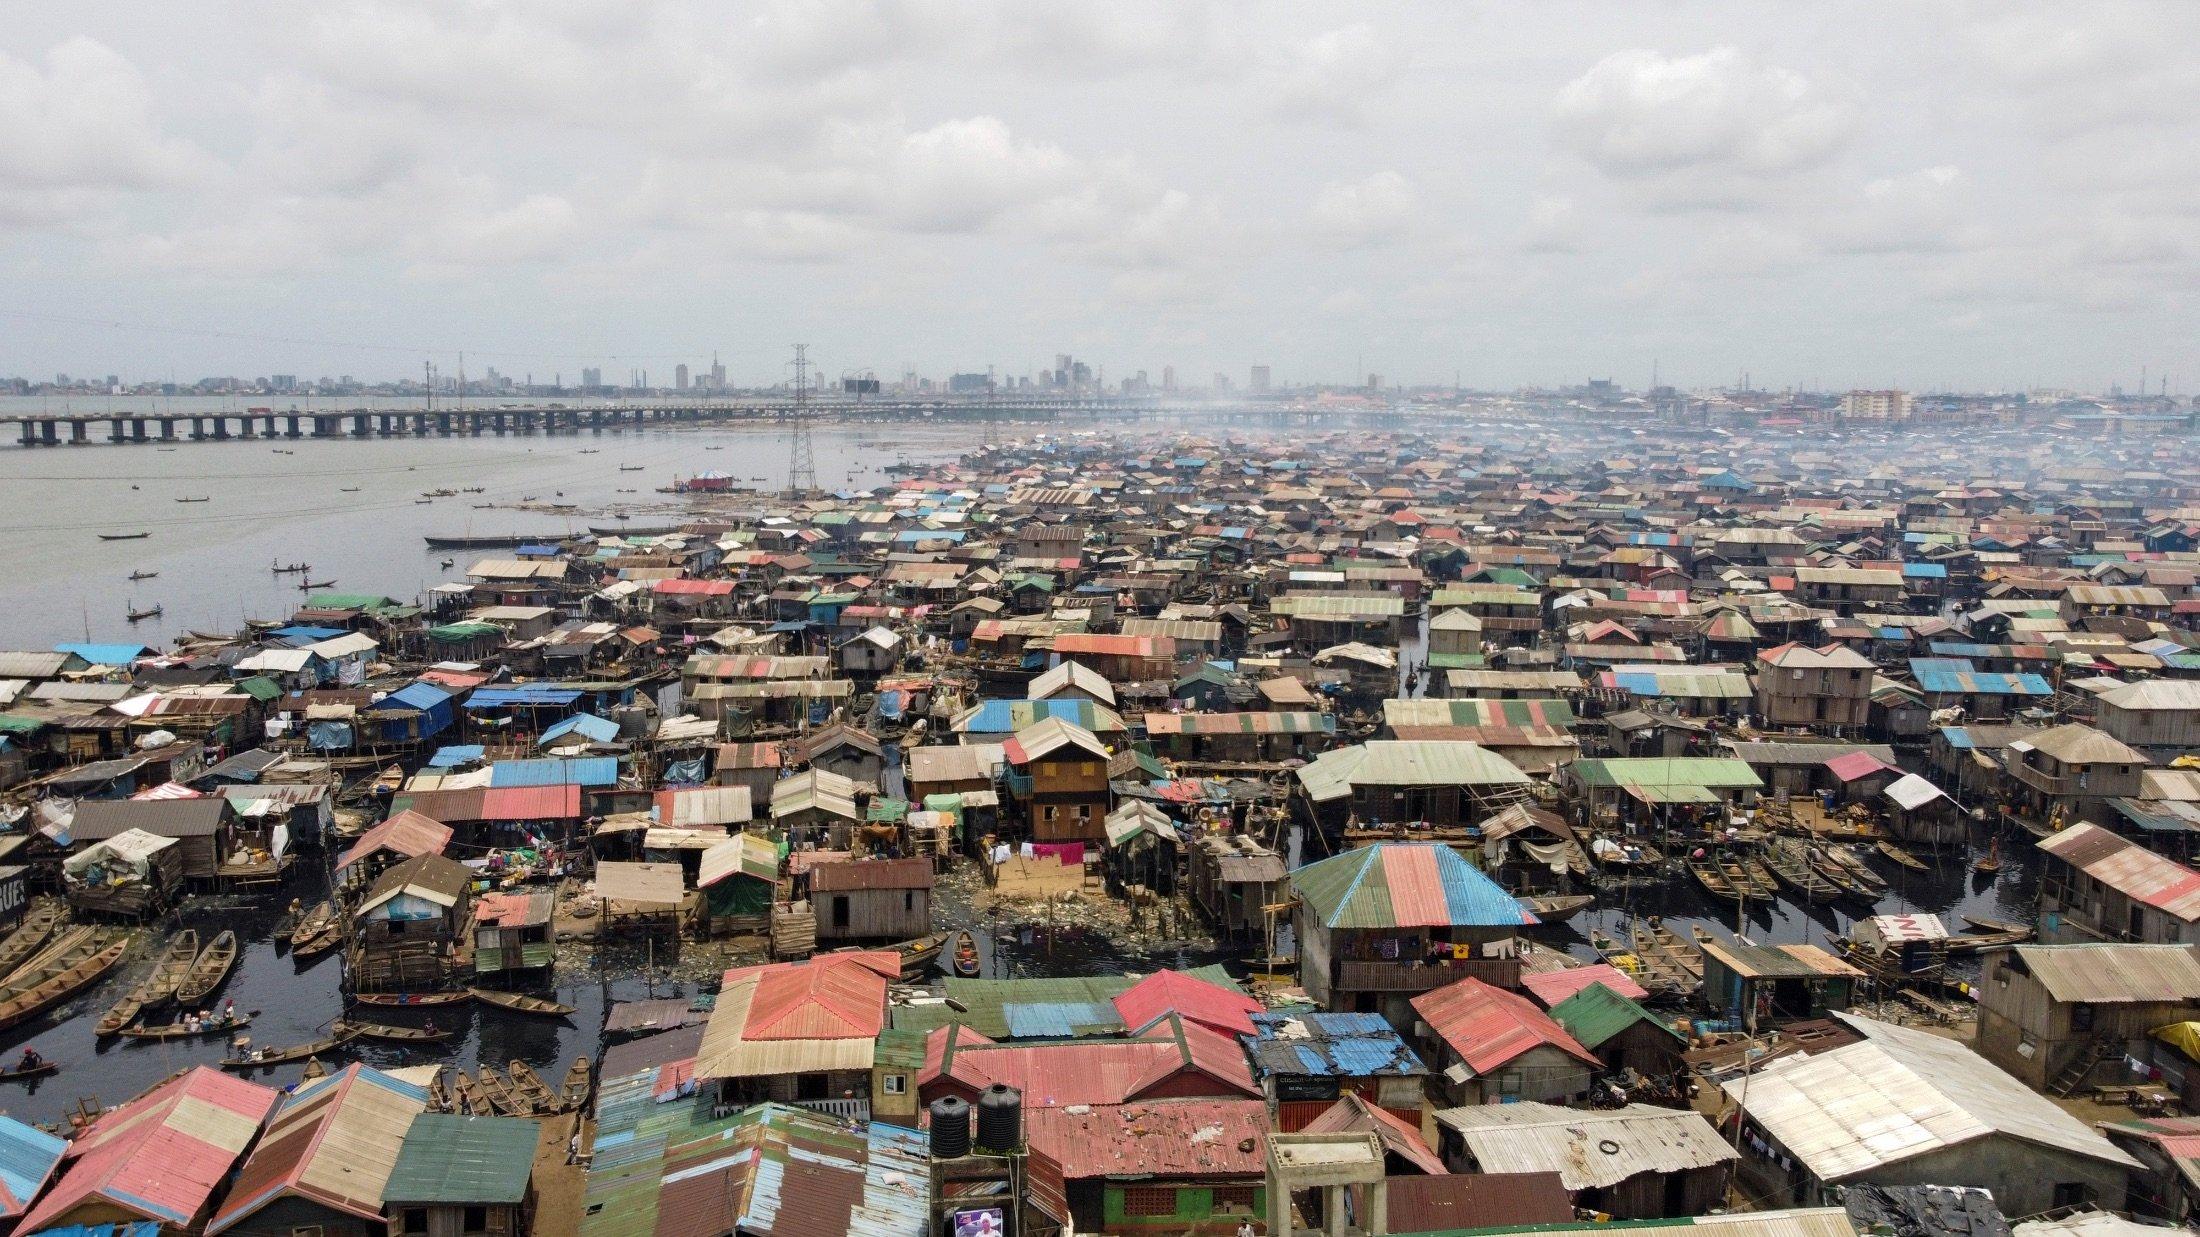 An aerial view of Makoko community in Lagos, Nigeria, May 2, 2021. (Reuters Photo)